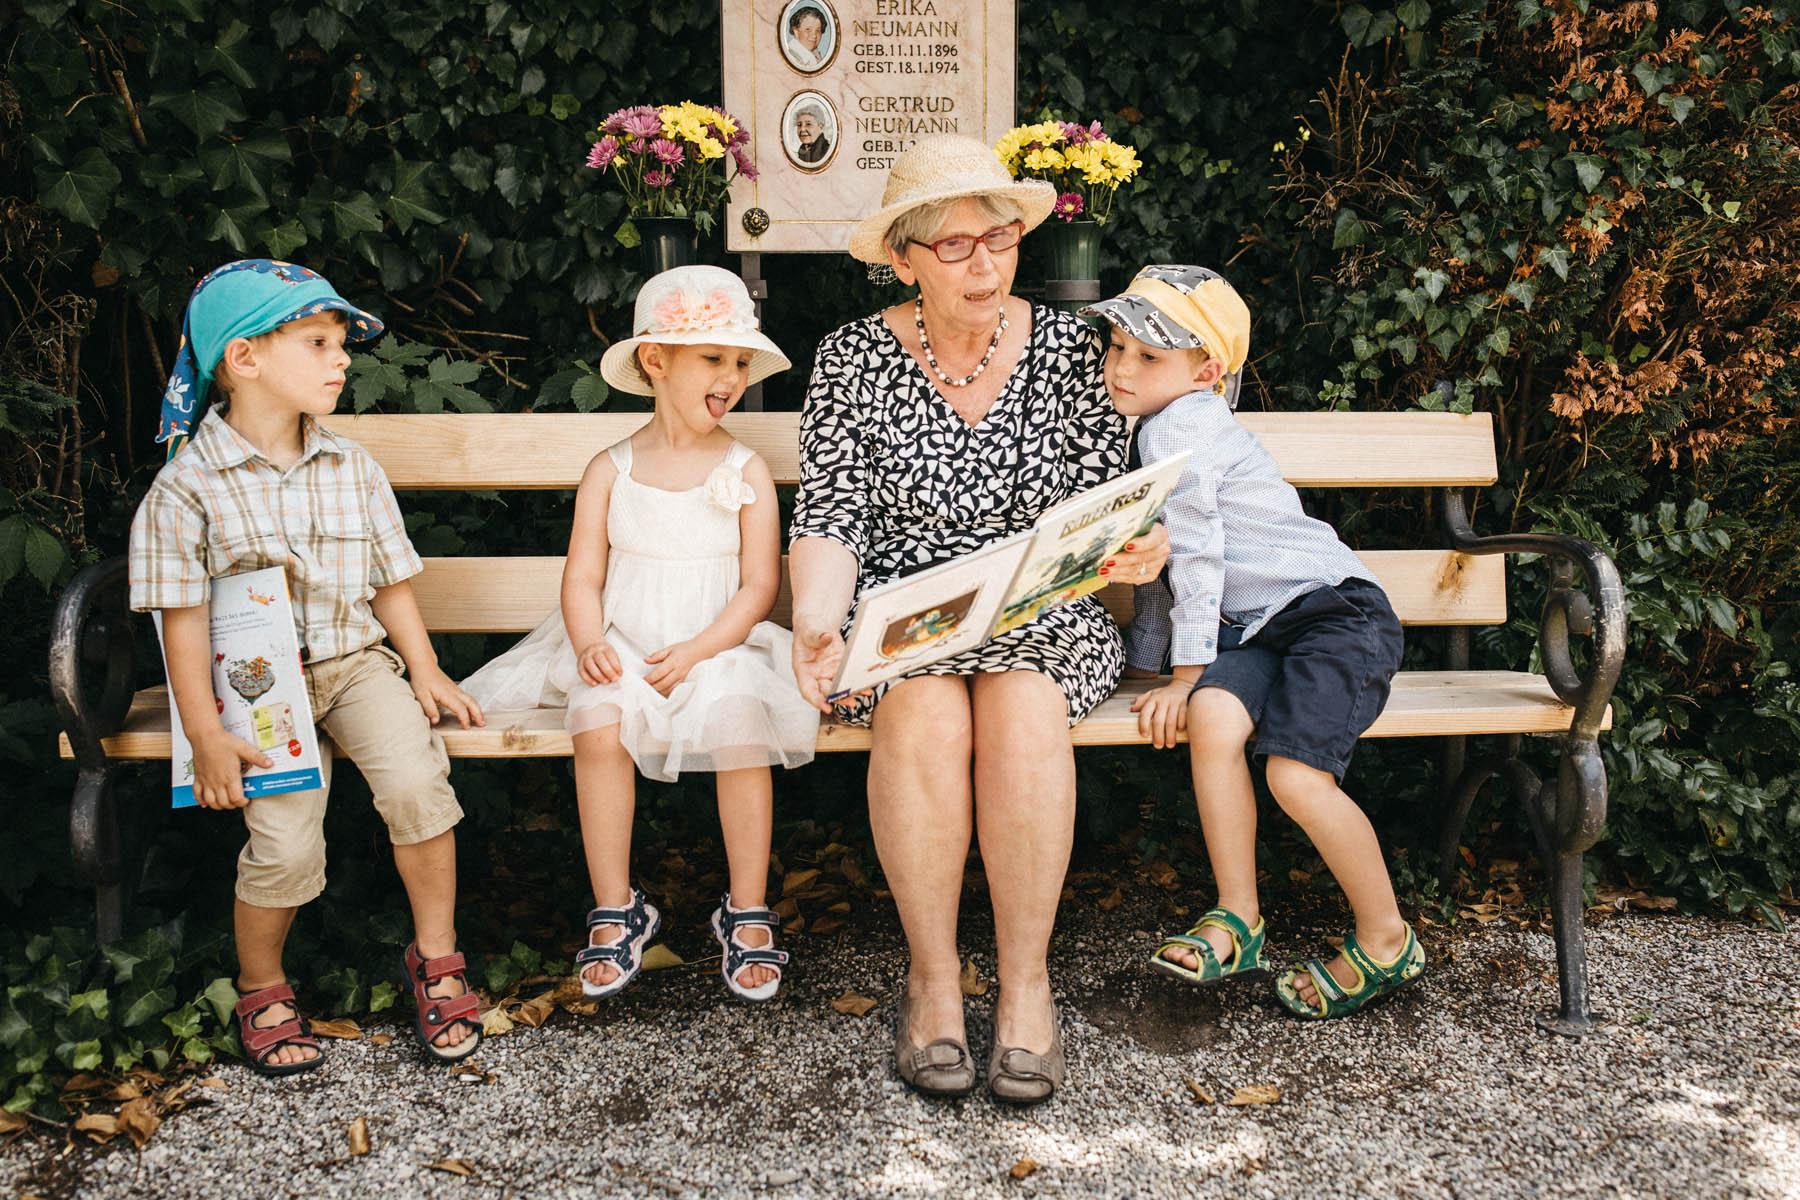 raissa simon fotografie hochzeit vintage starnberger see la villa 050 - Patricia + Maximilian